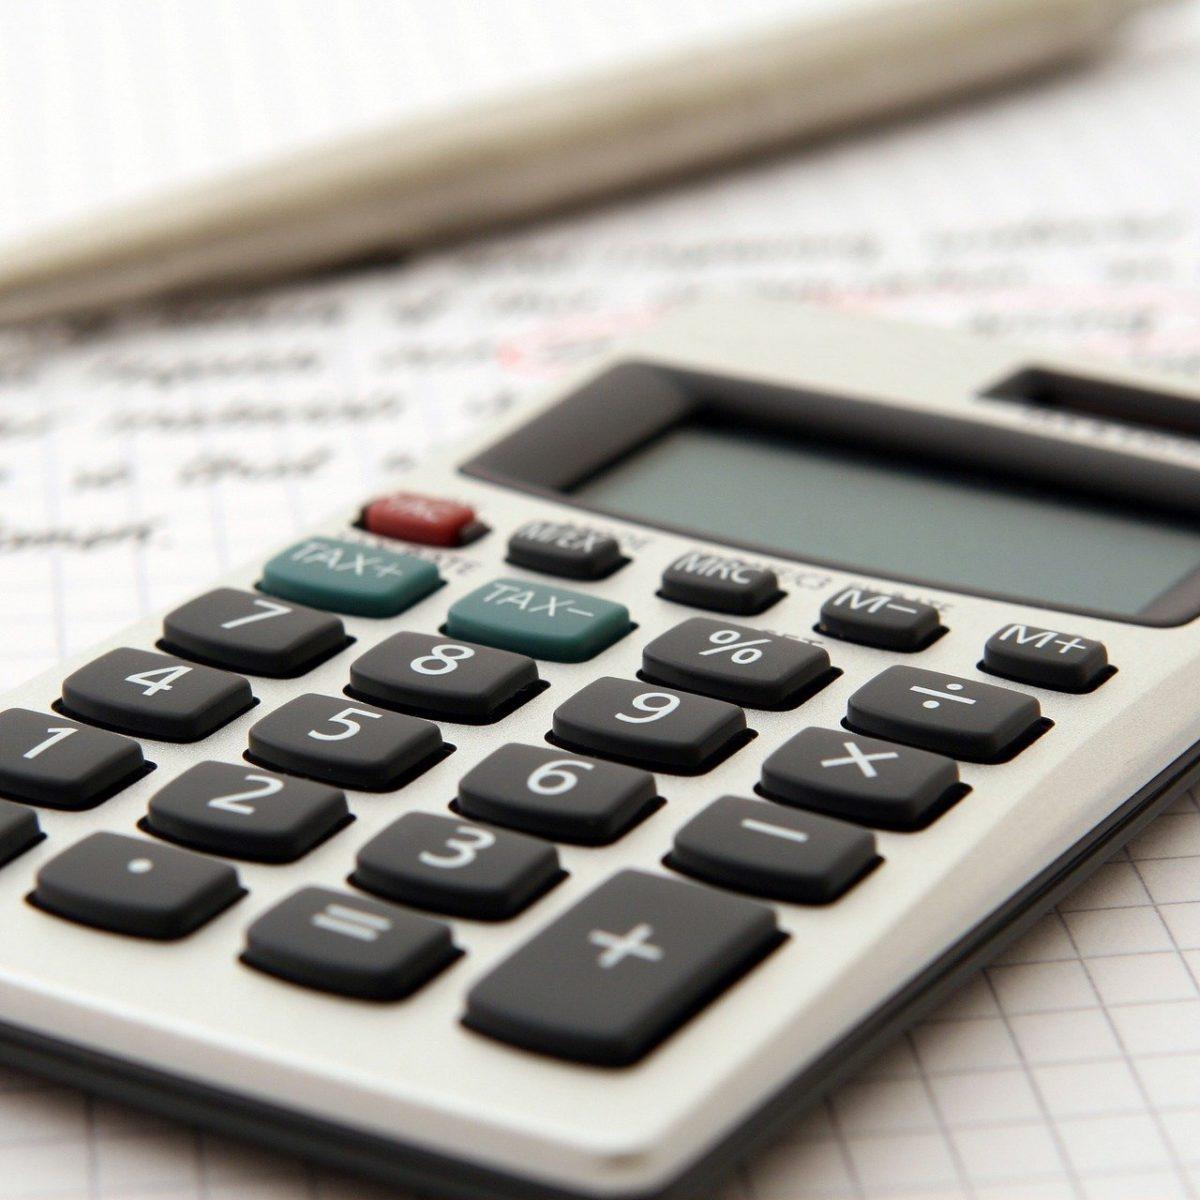 Imposto global pode render 5,5 bilhões ao Brasil